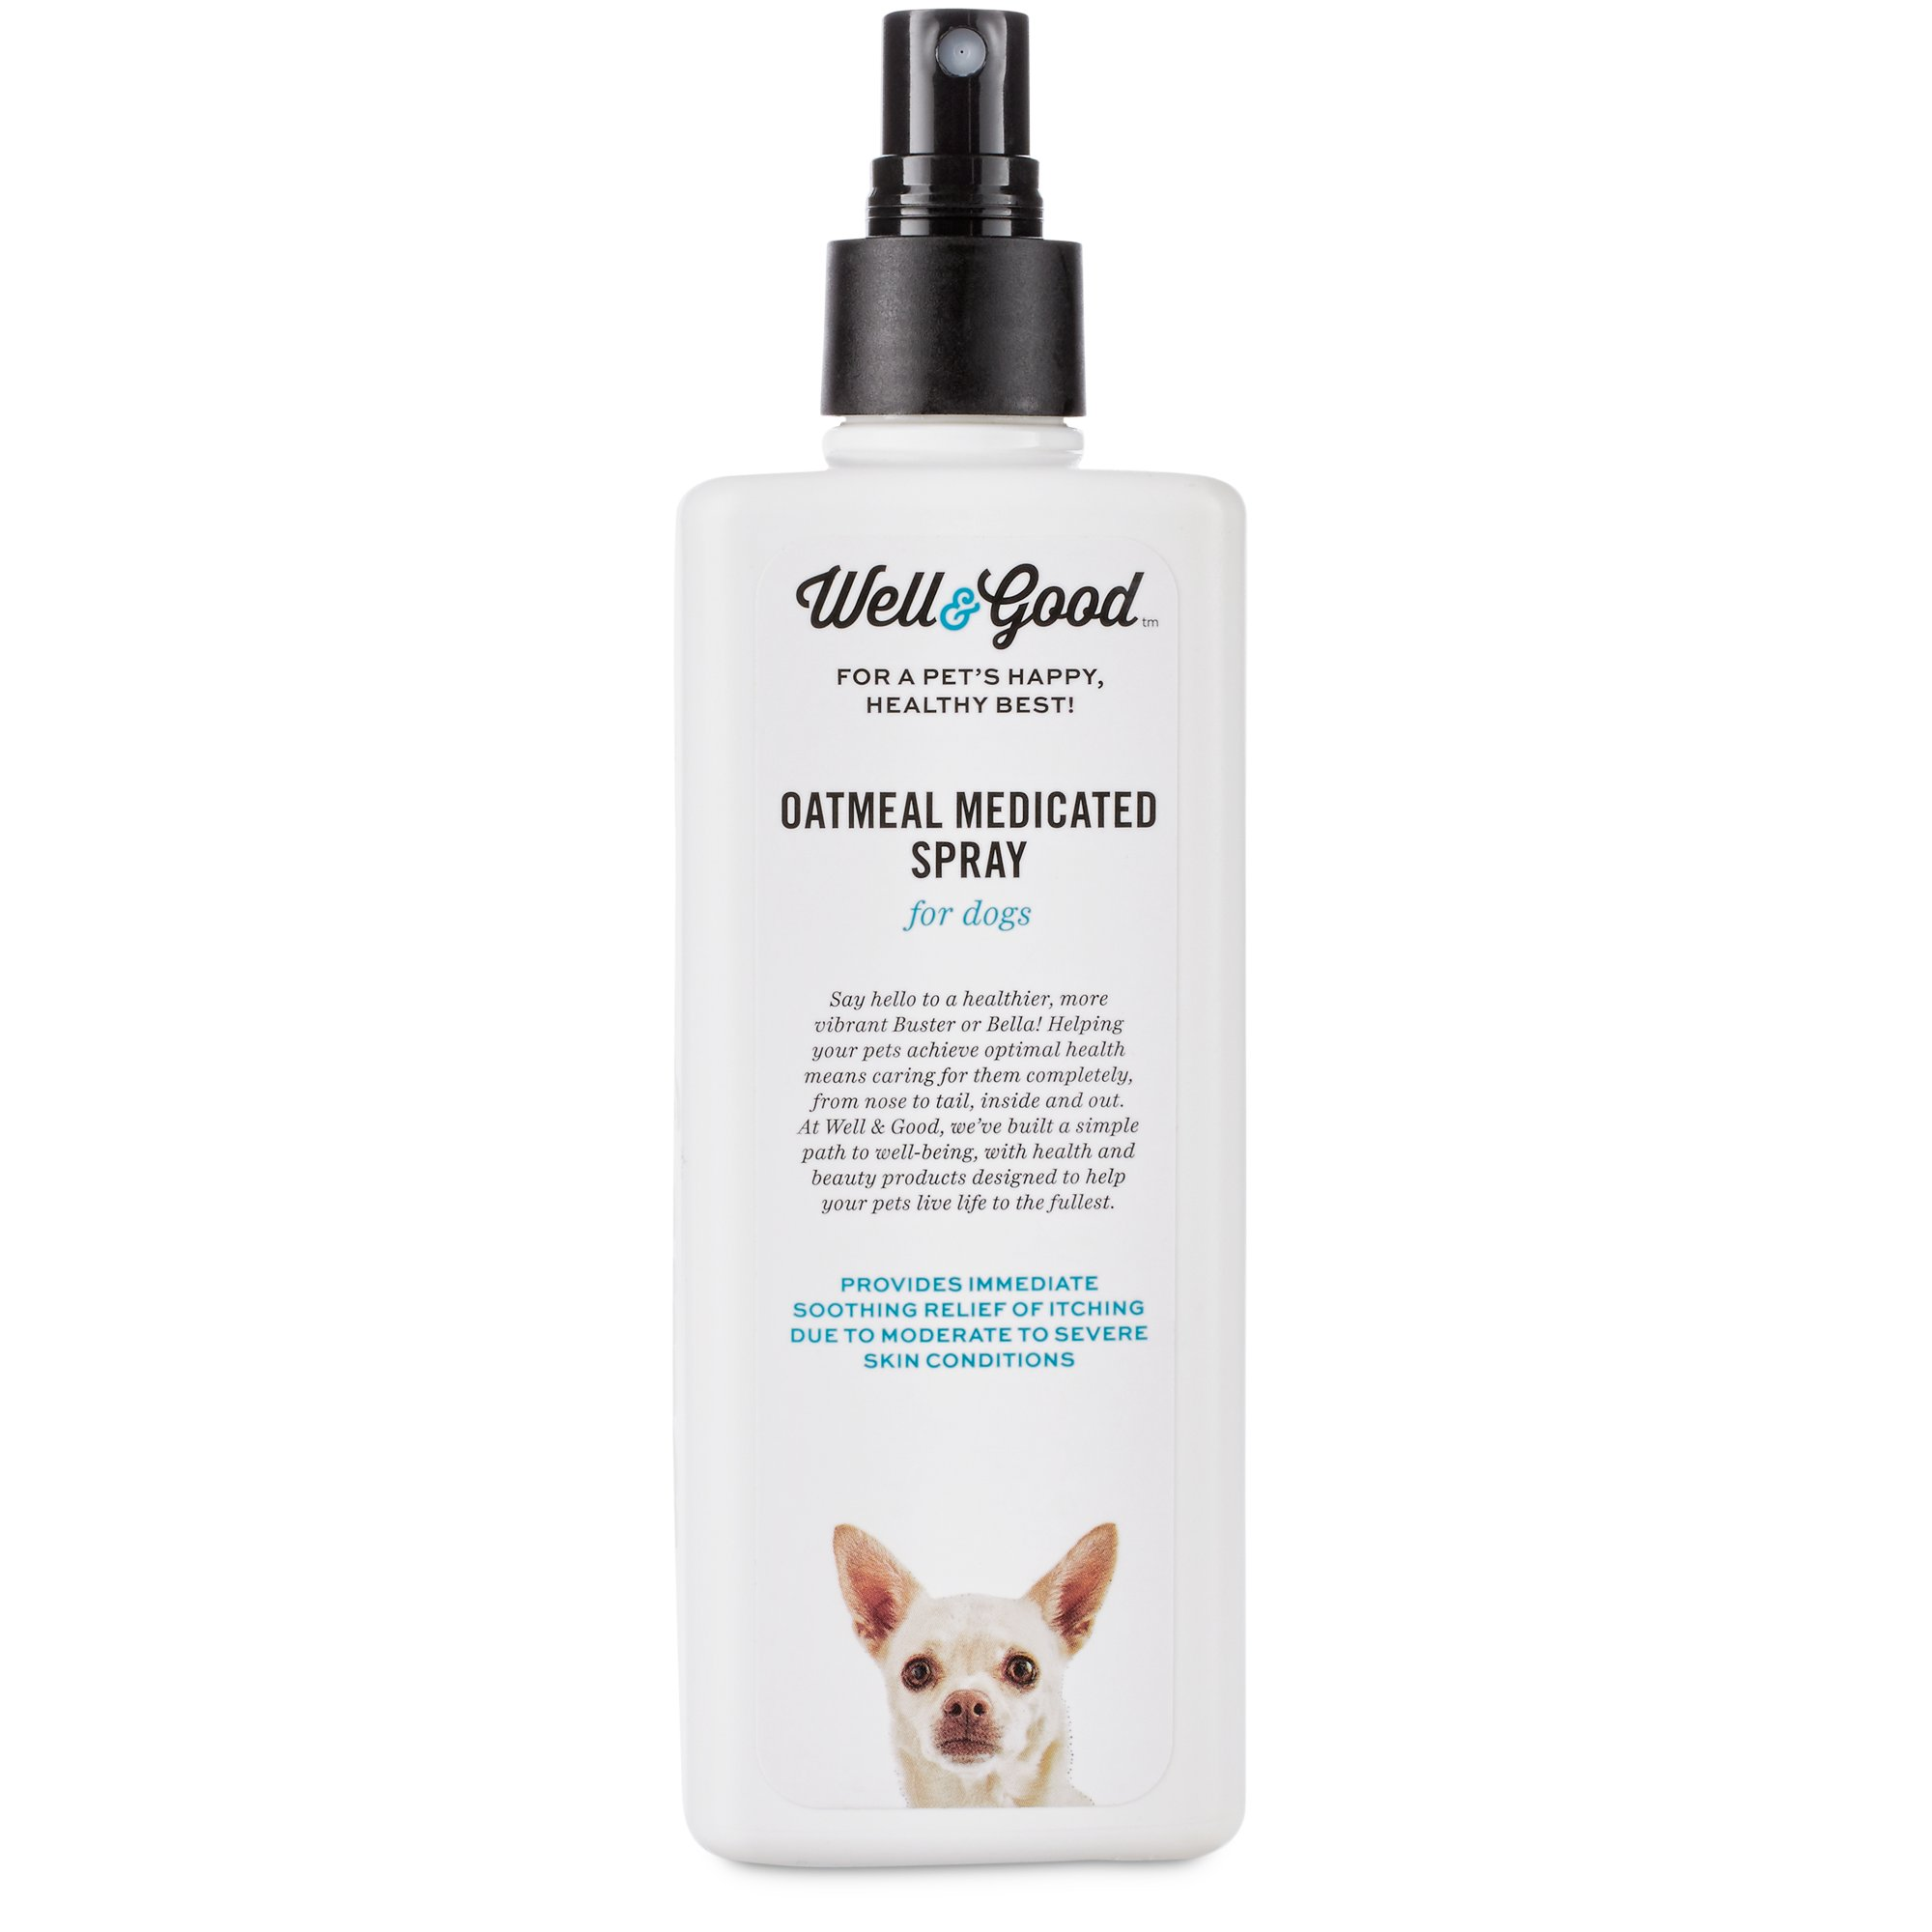 Well & Good Oatmeal Medicated Dog Spray